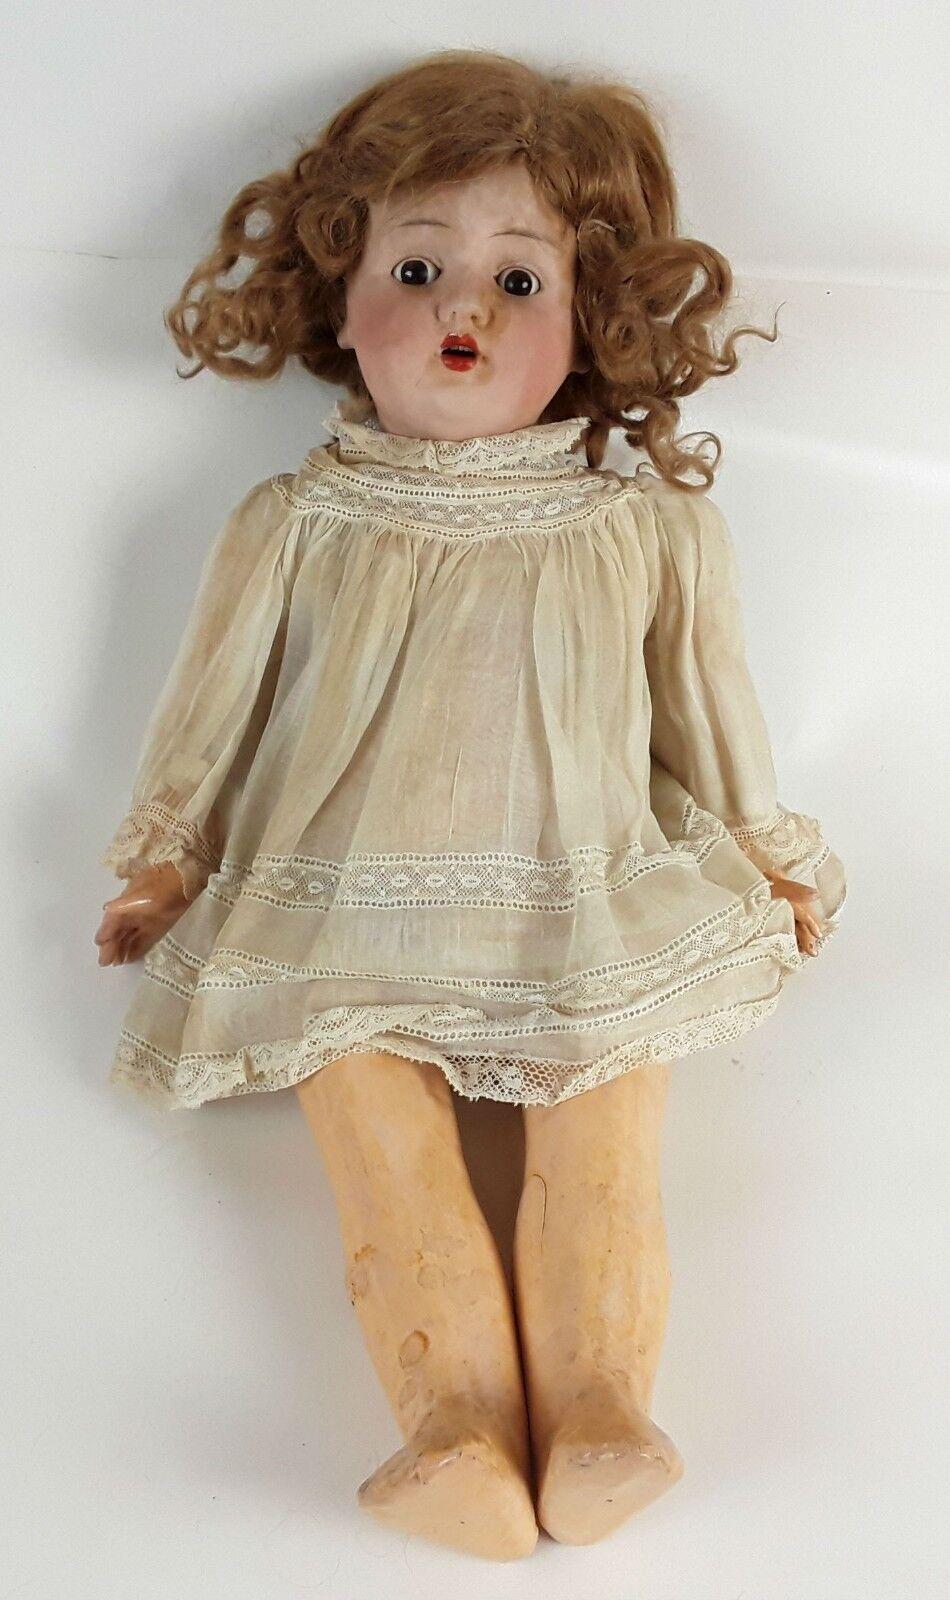 Muñeca Jules verlingue. Francia. Princ. S. XX